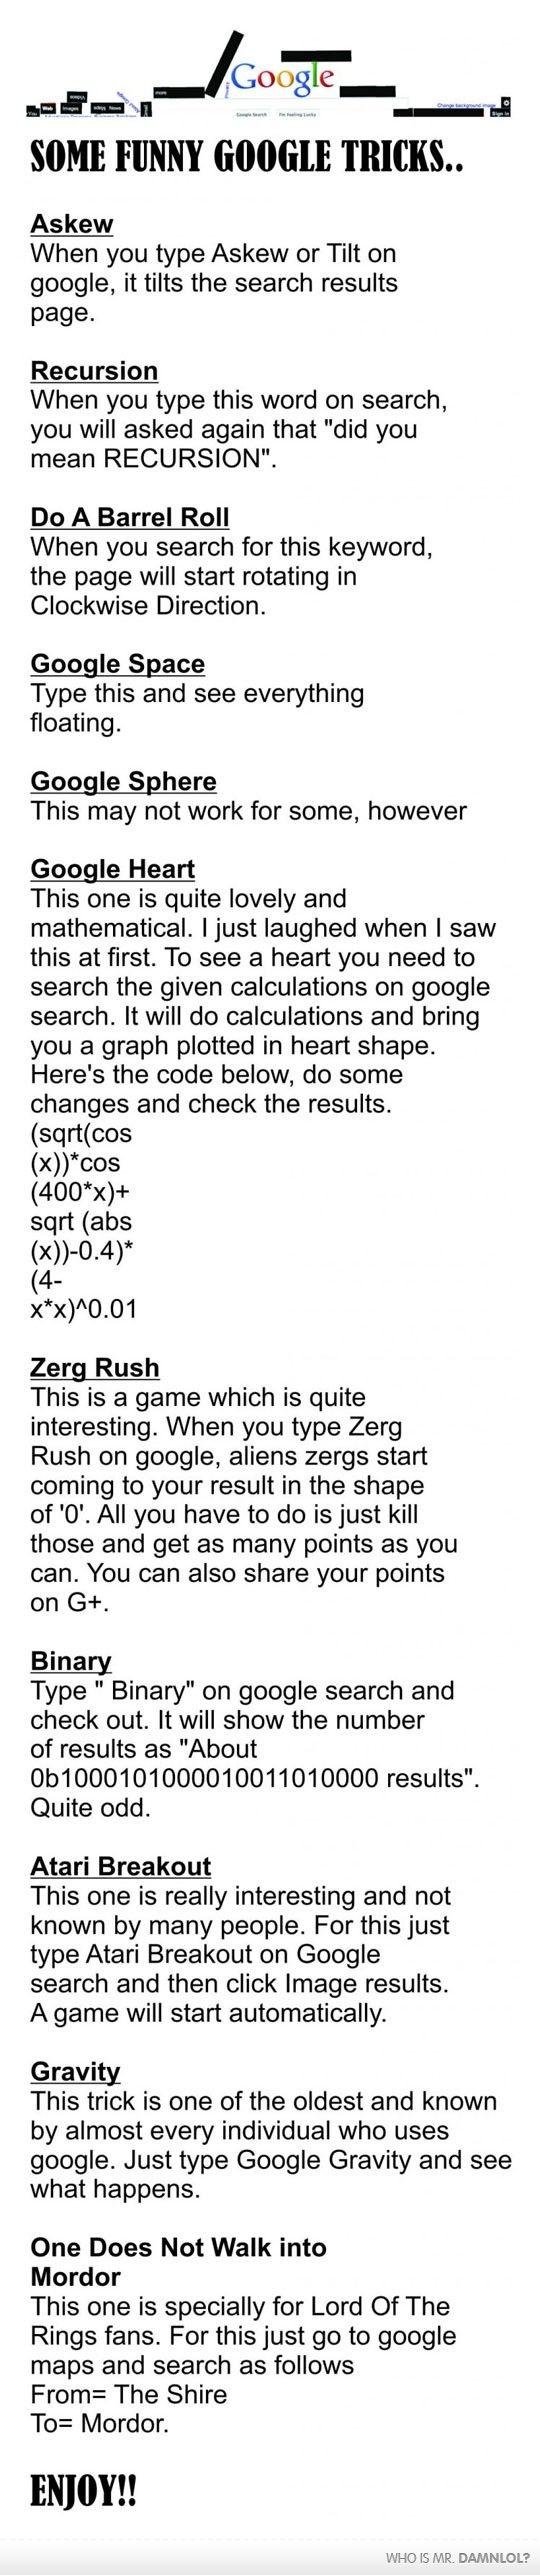 Funny Google Tricks - Damn! LOL